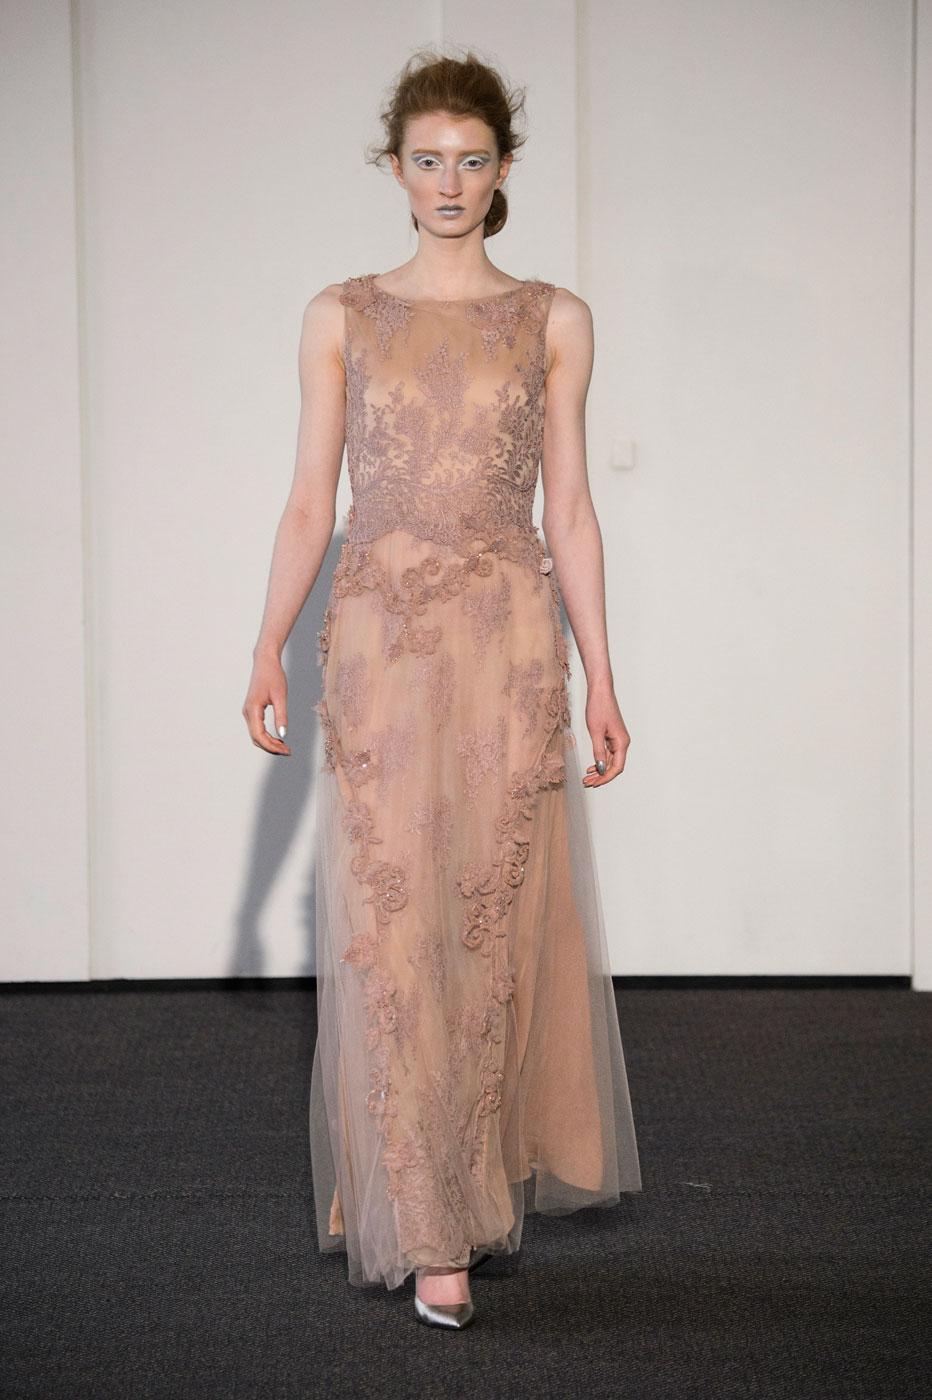 Busardi-fashion-runway-show-haute-couture-paris-spring-2015-the-impression-46